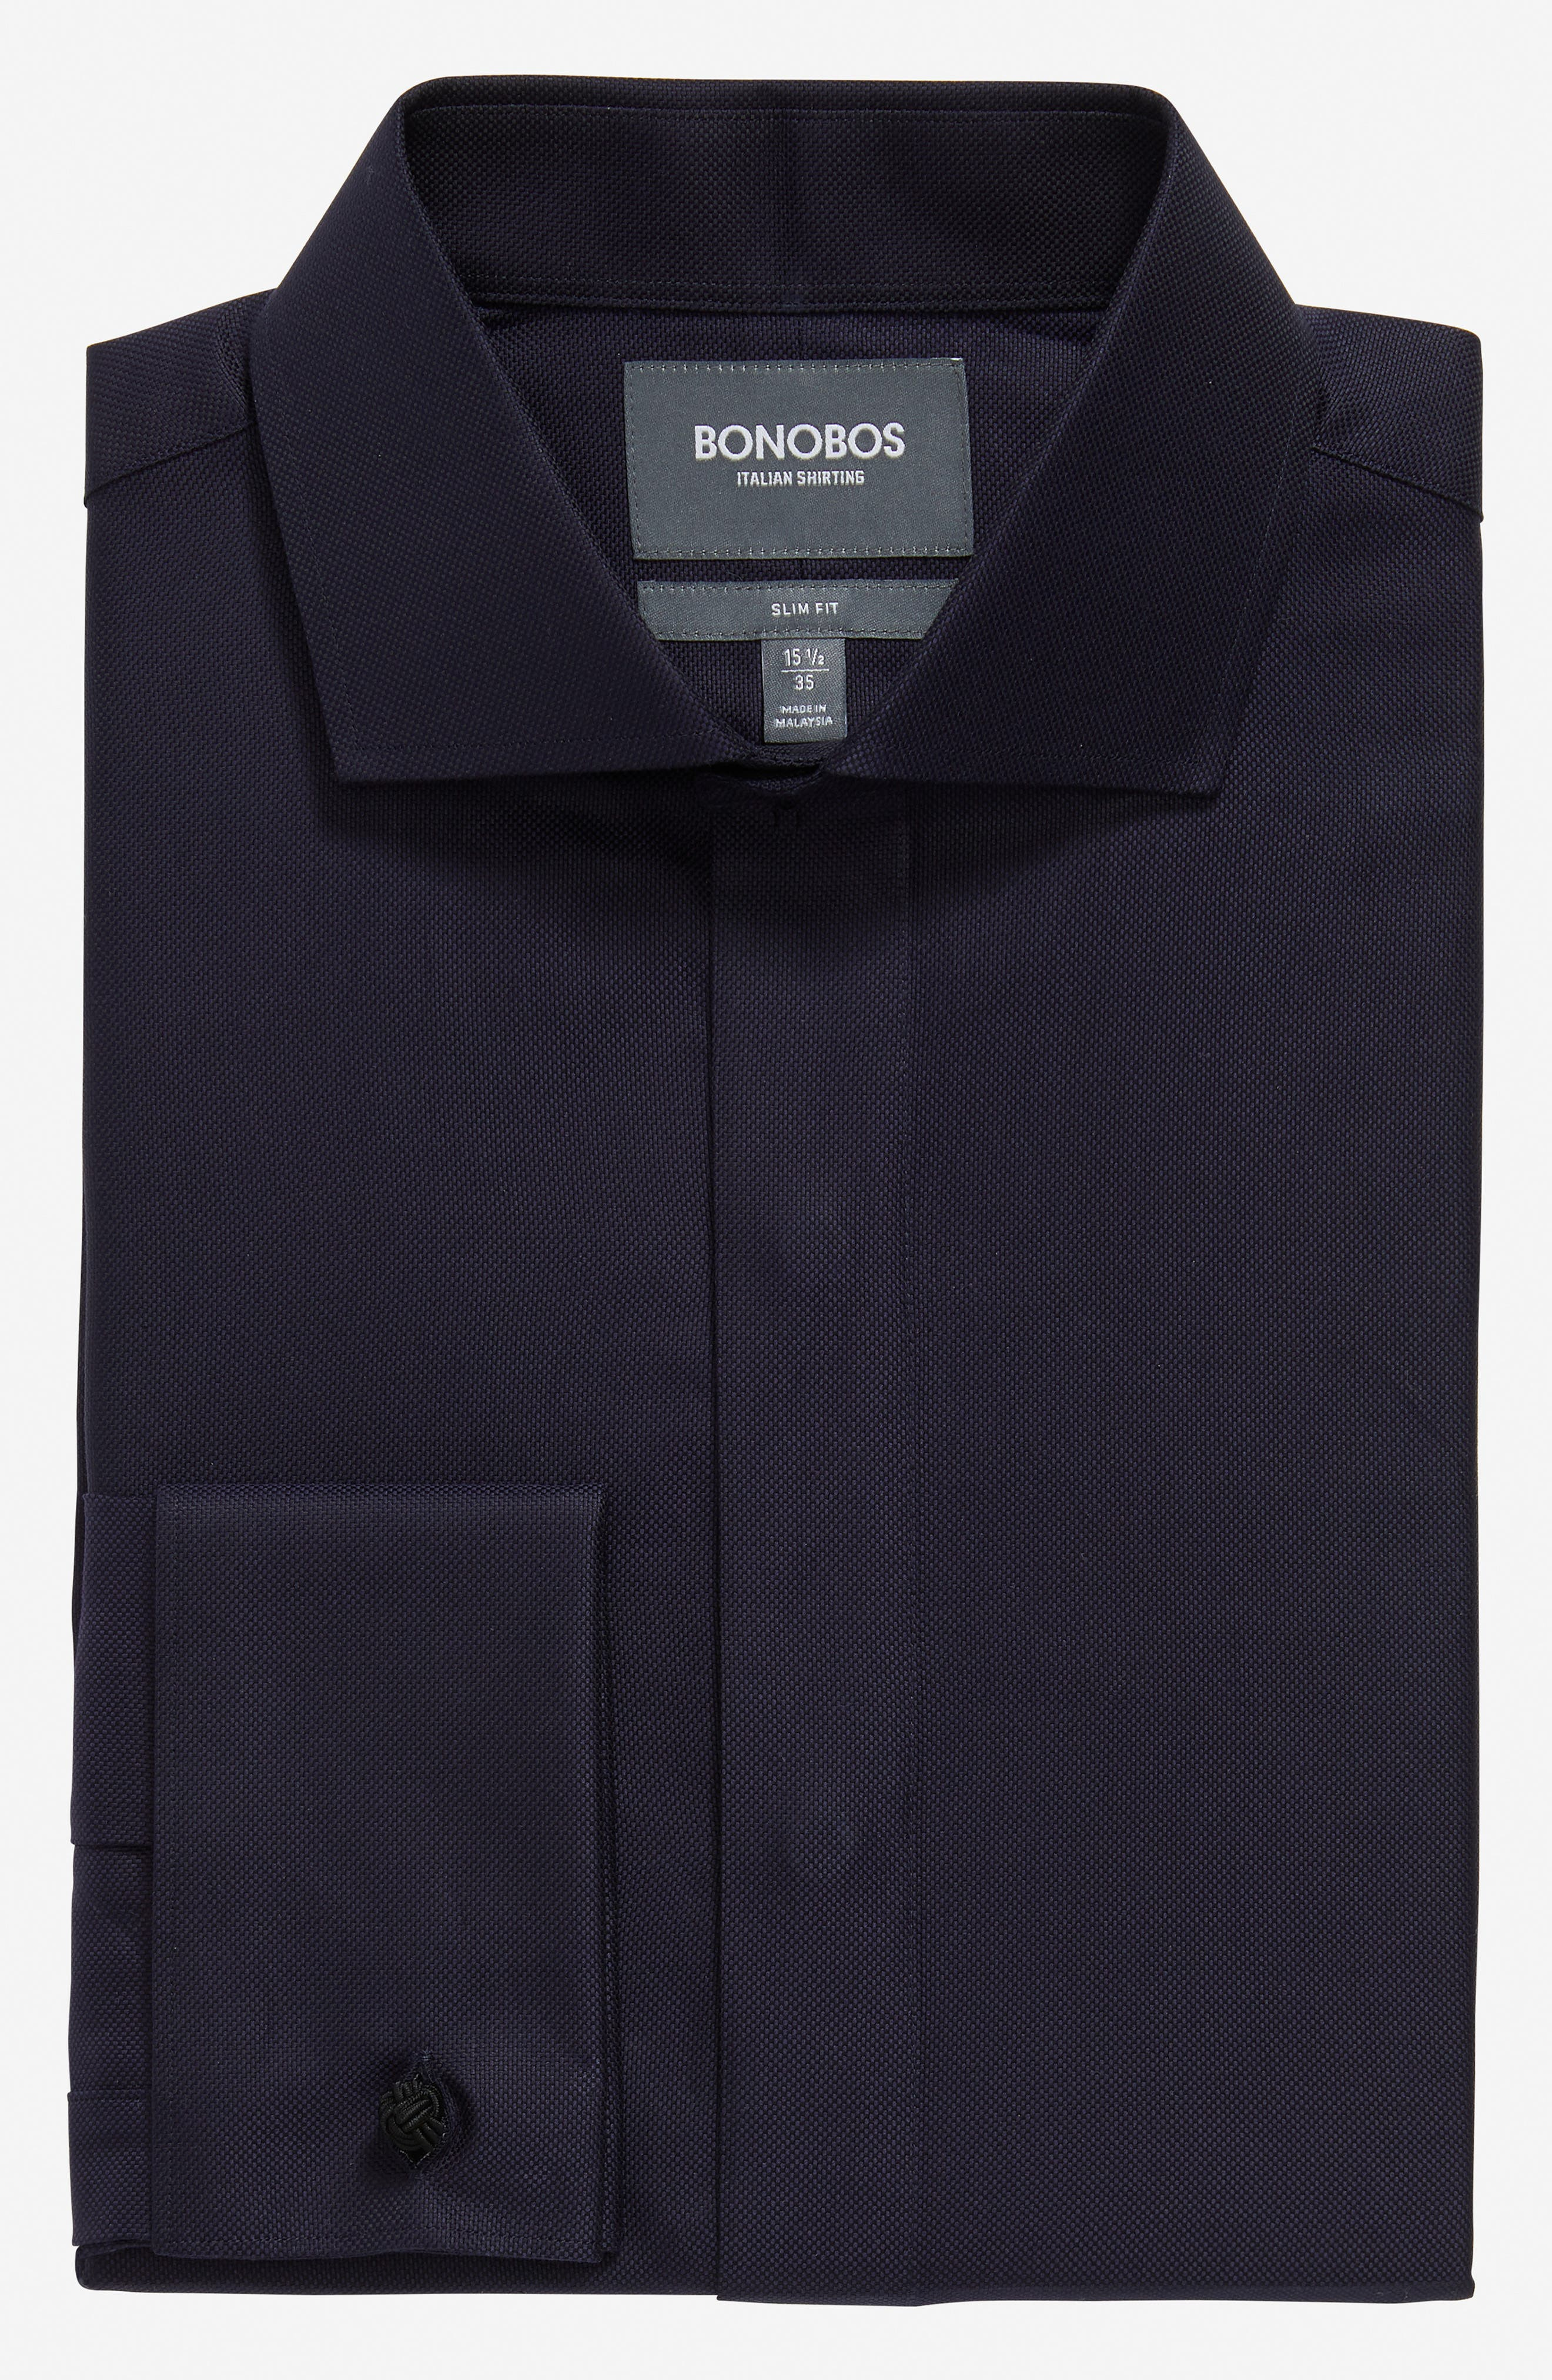 Image of Bonobos Solid Colorway Slim Fit Dress Shirt